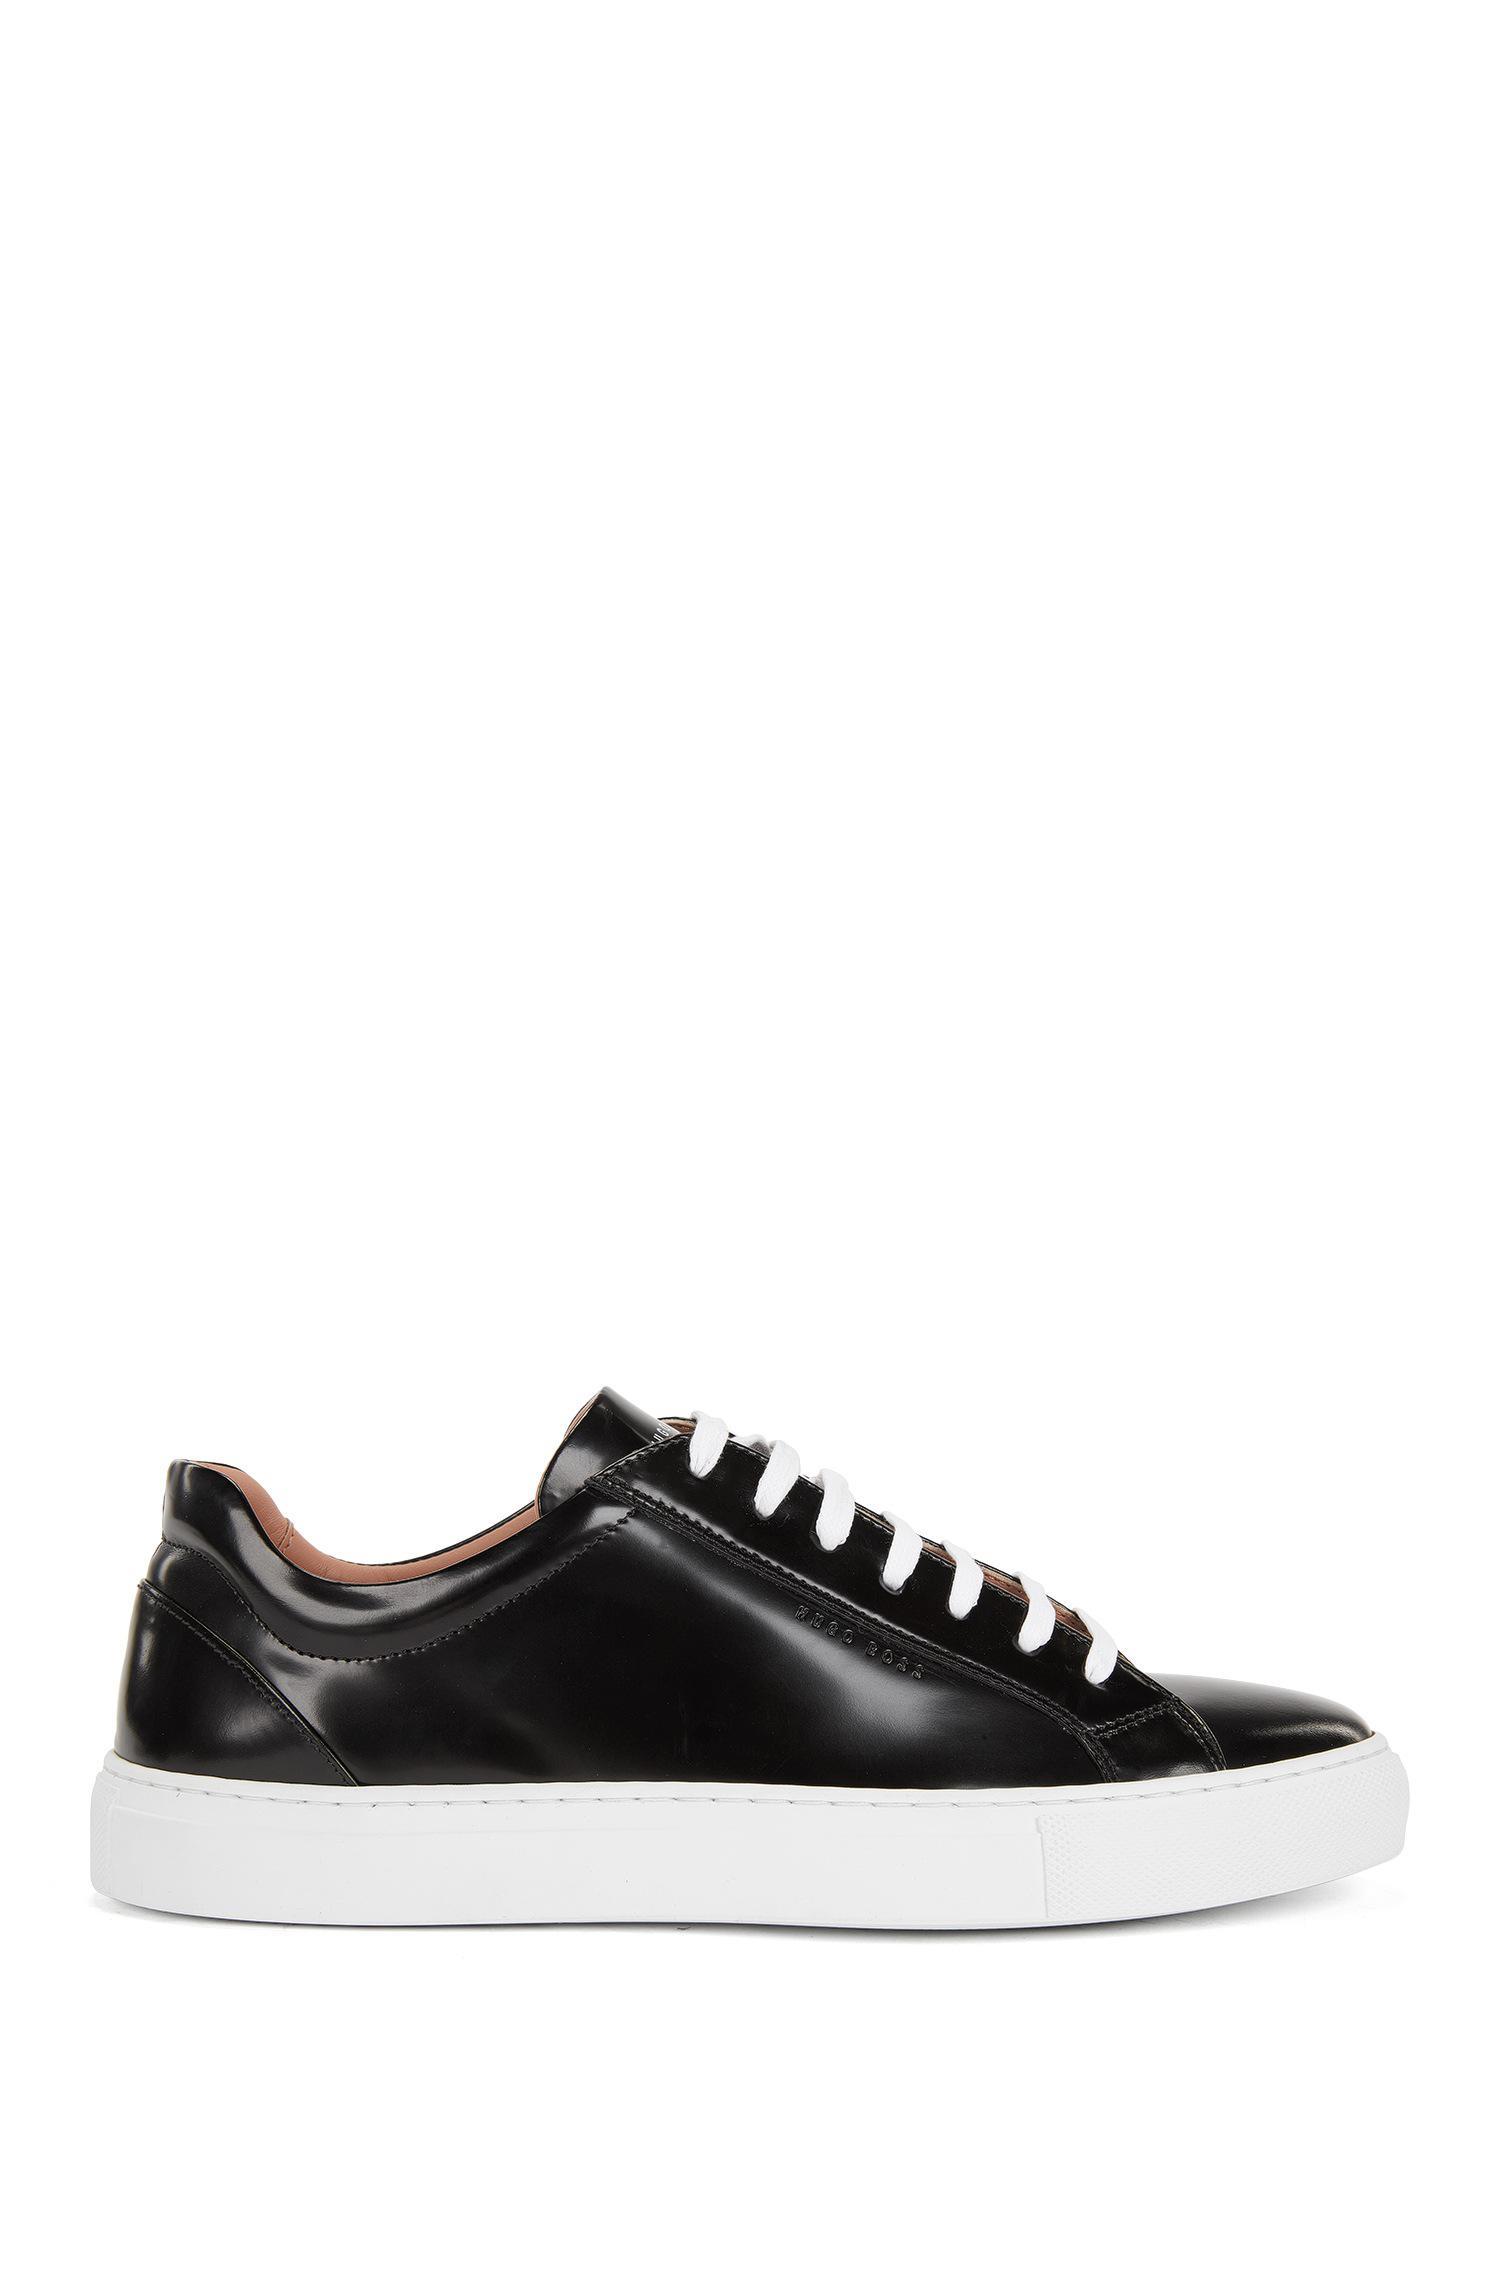 panelled low-top sneakers - Black HUGO BOSS pXn8m